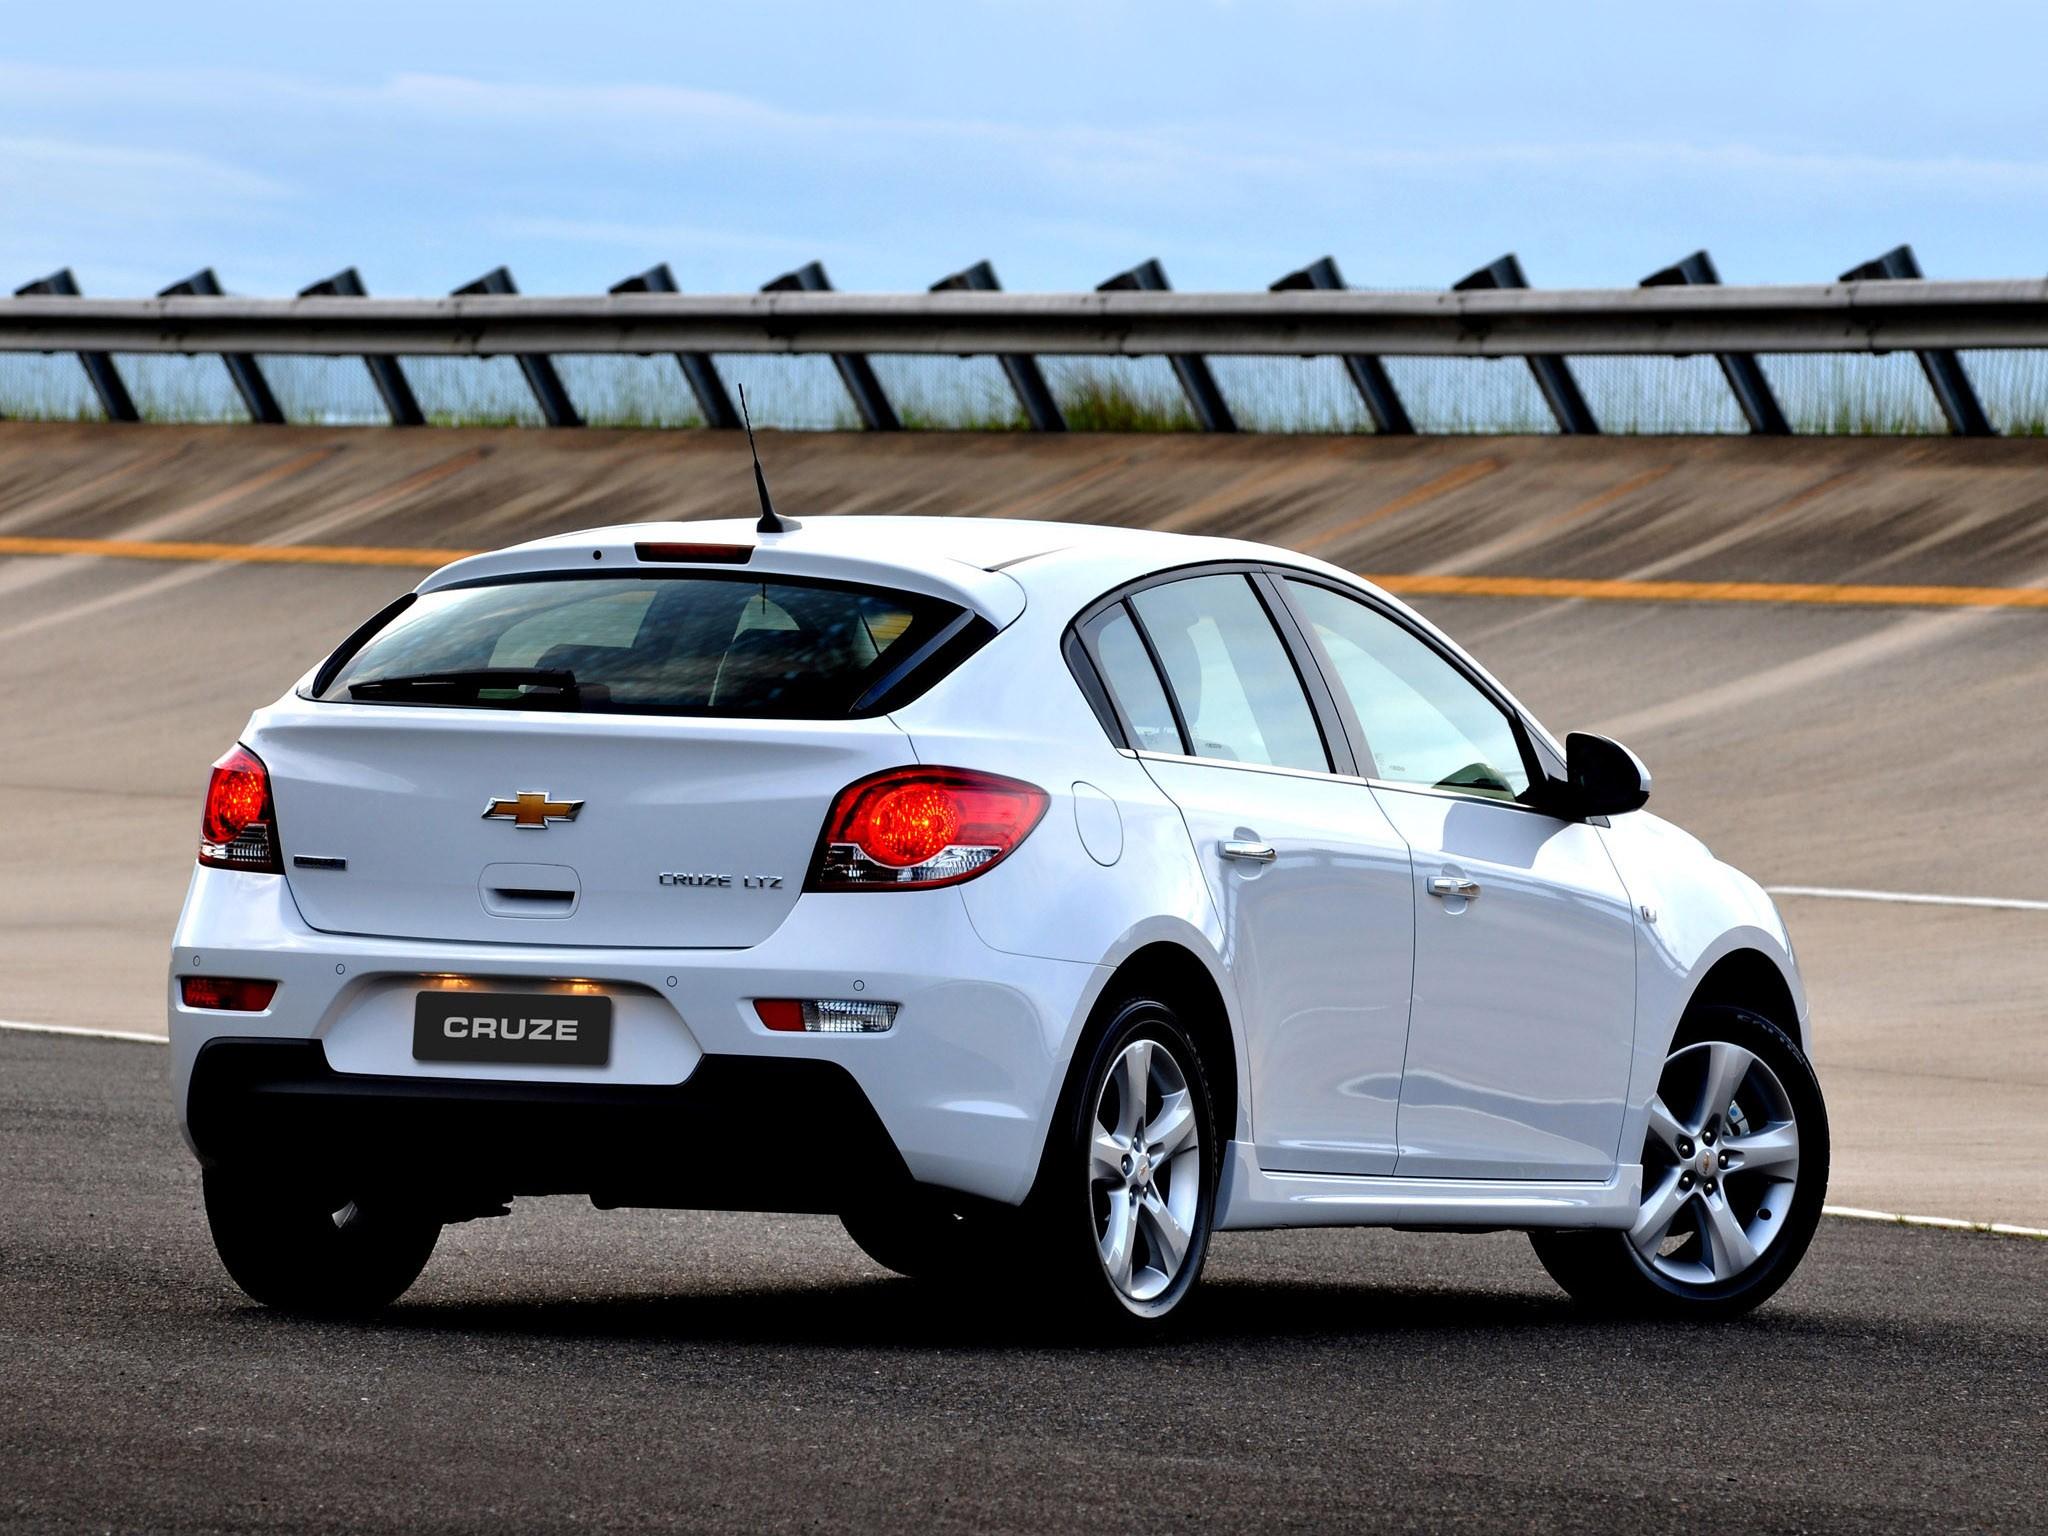 2012 Chevrolet Cruze Sport 6